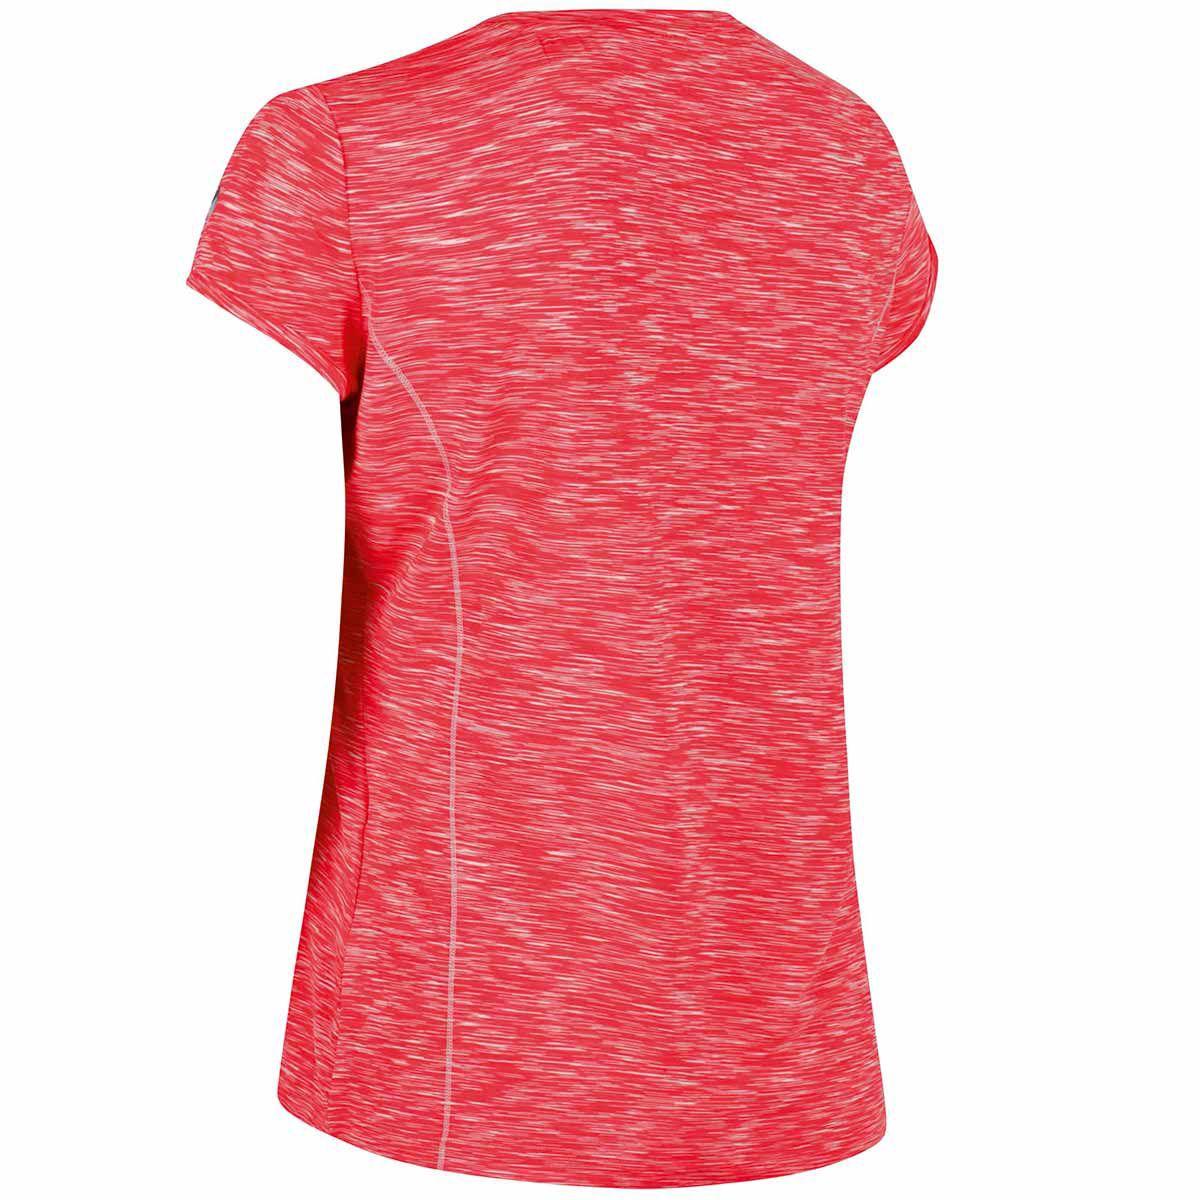 Regatta Great Outdoors Womens/Ladies Hyperdimension Short Sleeve T-Shirt